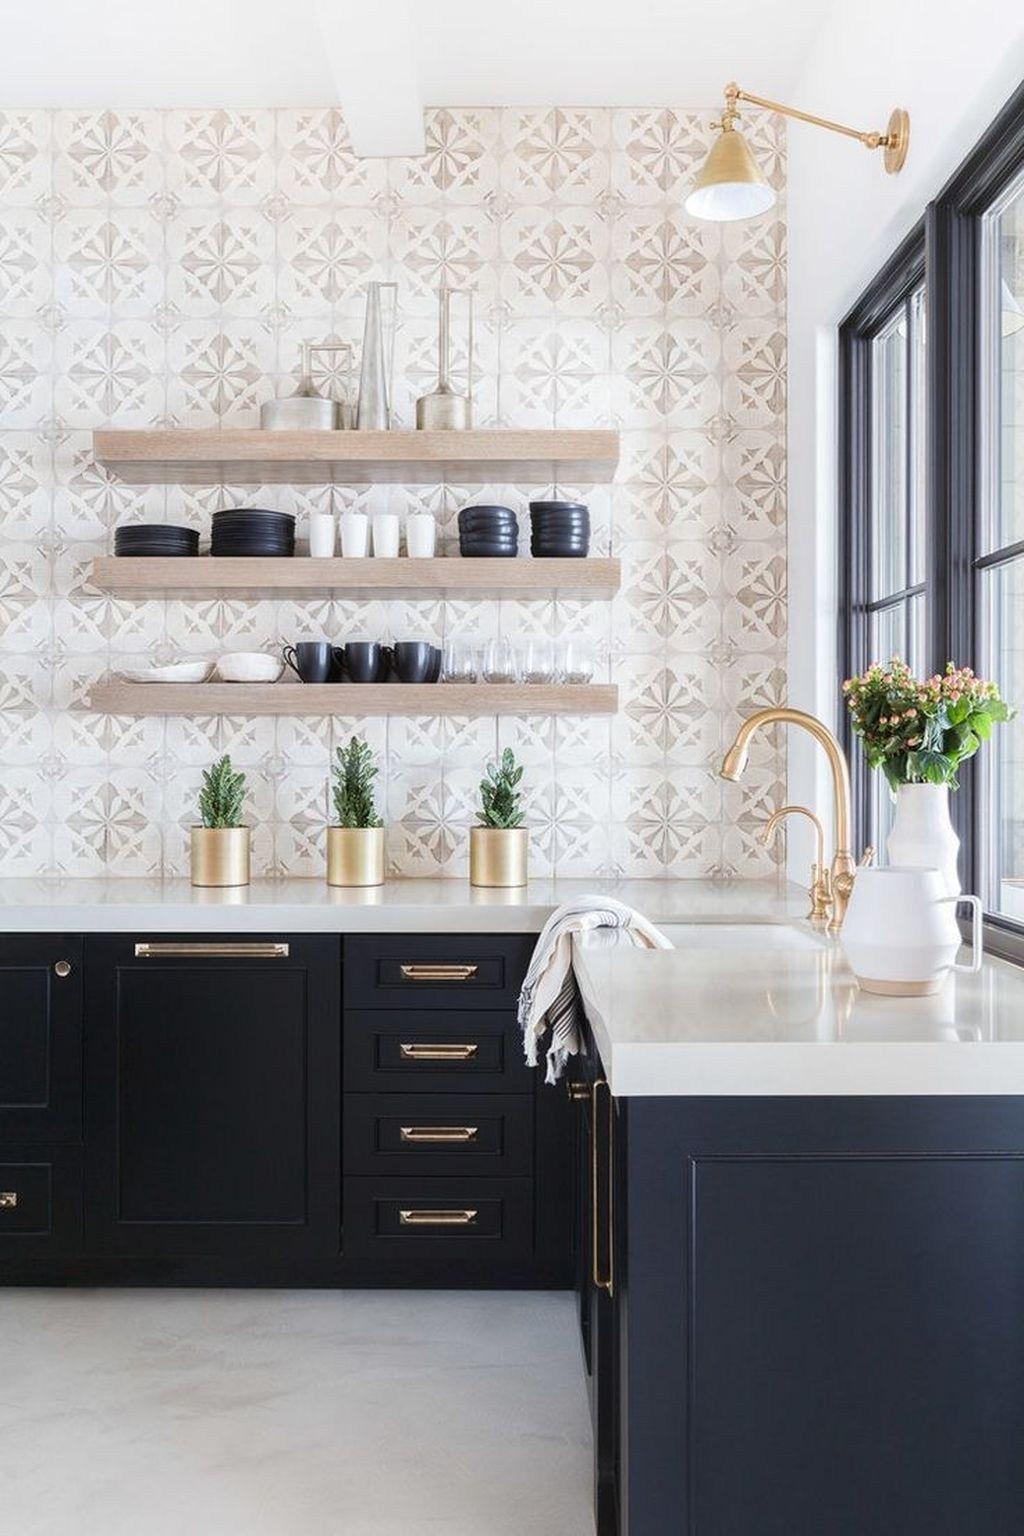 Cool Modern Farmhouse Kitchen Backsplash Ideas 13 Modern